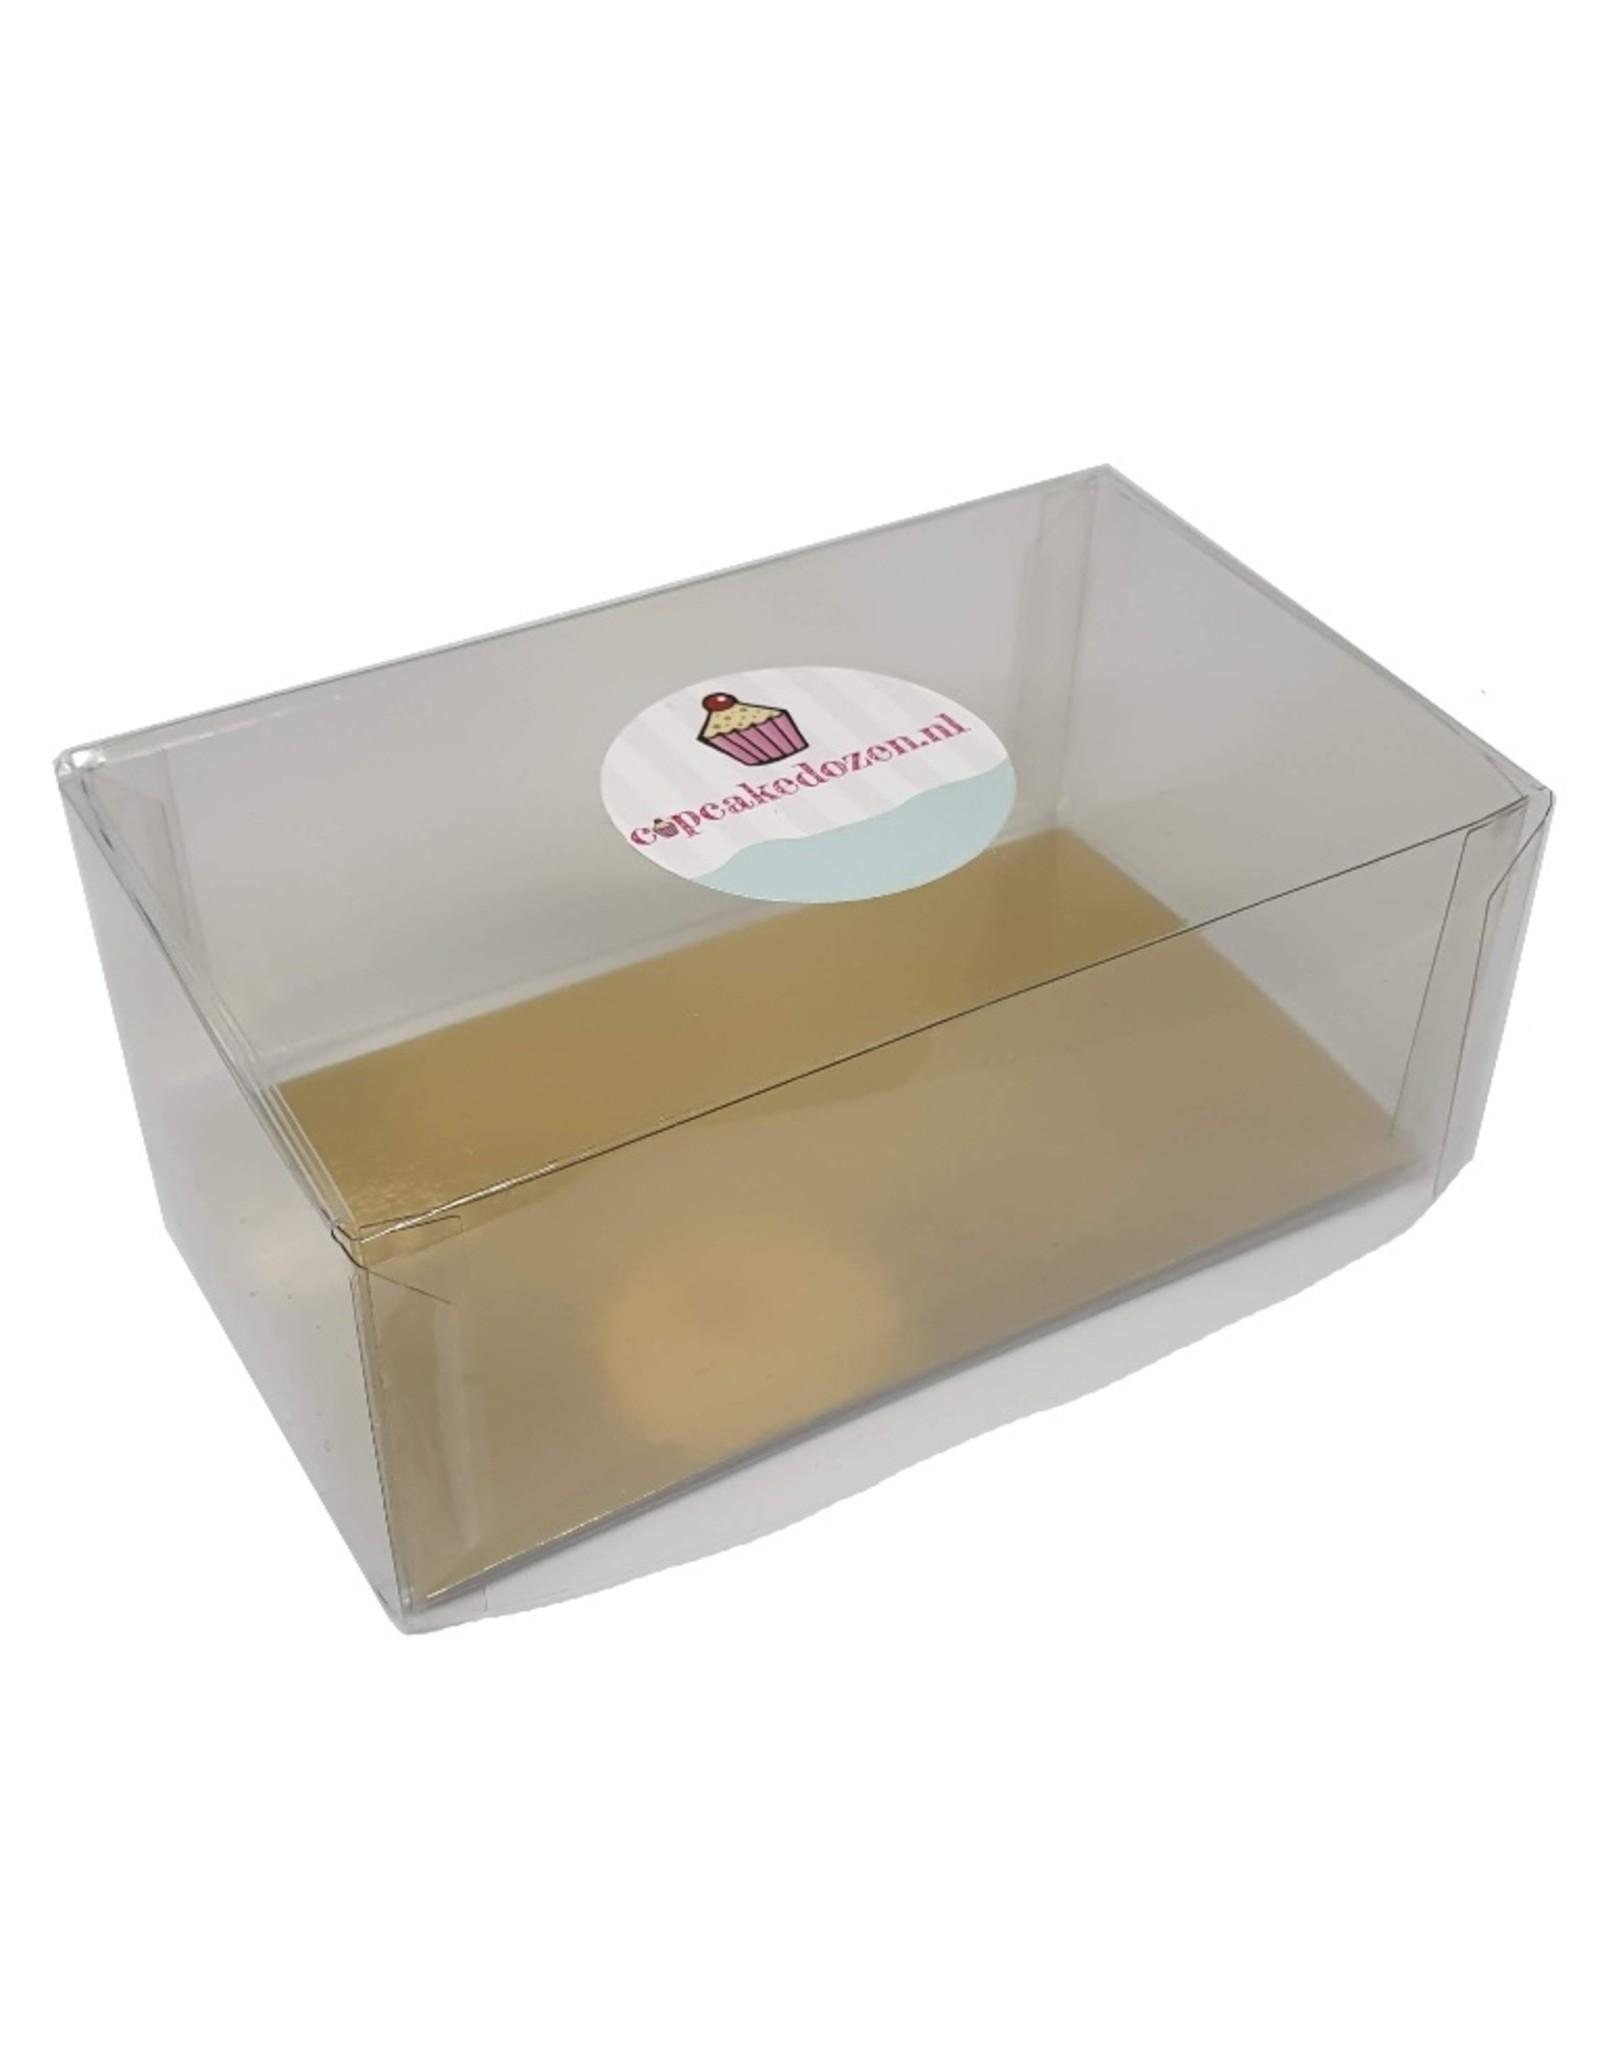 Transparante doos rechthoek hoog - diverse maten